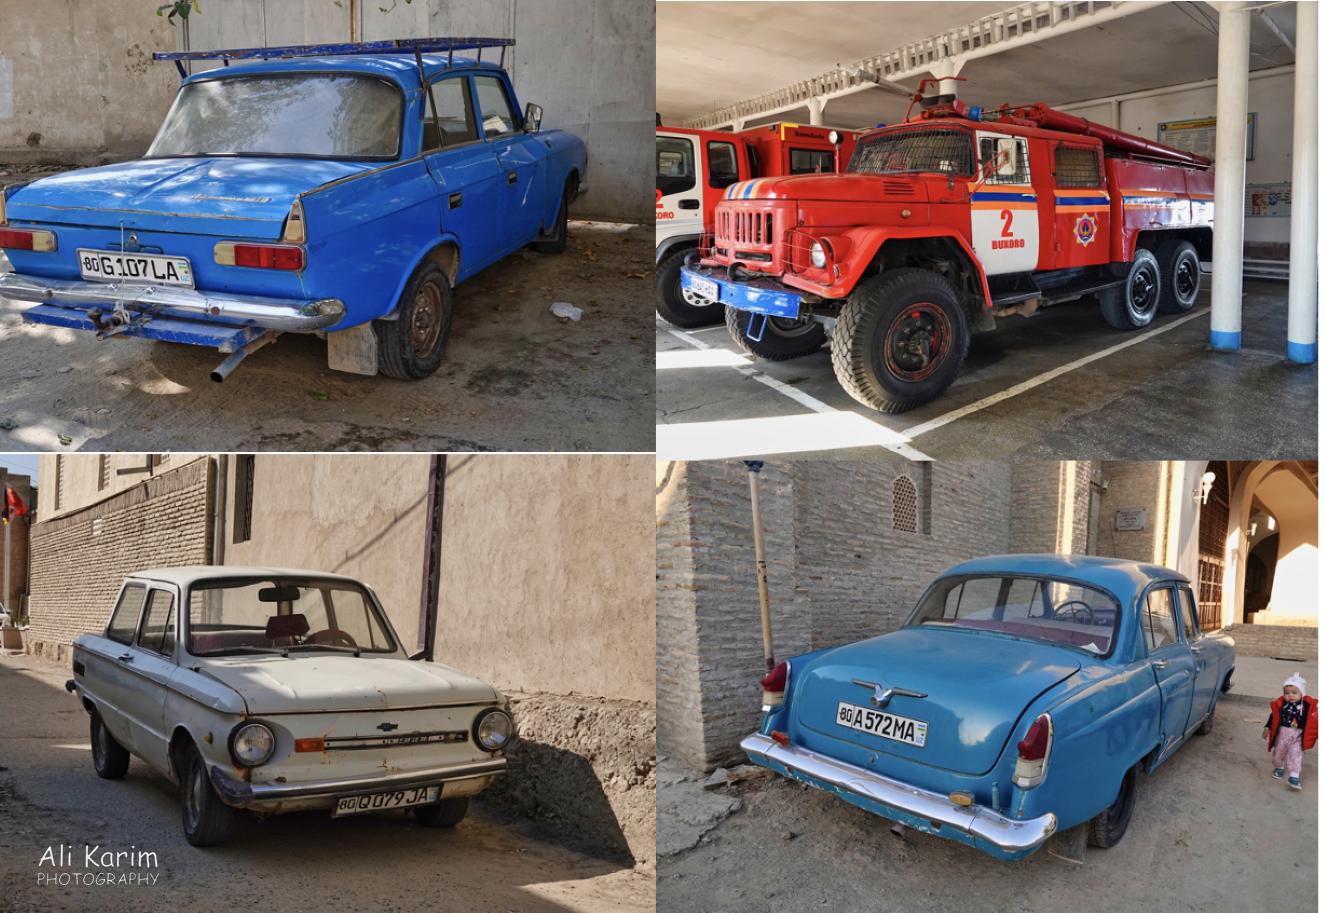 Bukhara, Oct 2019, I love these old vehicles, still functional. Any idea of make/model/specs?